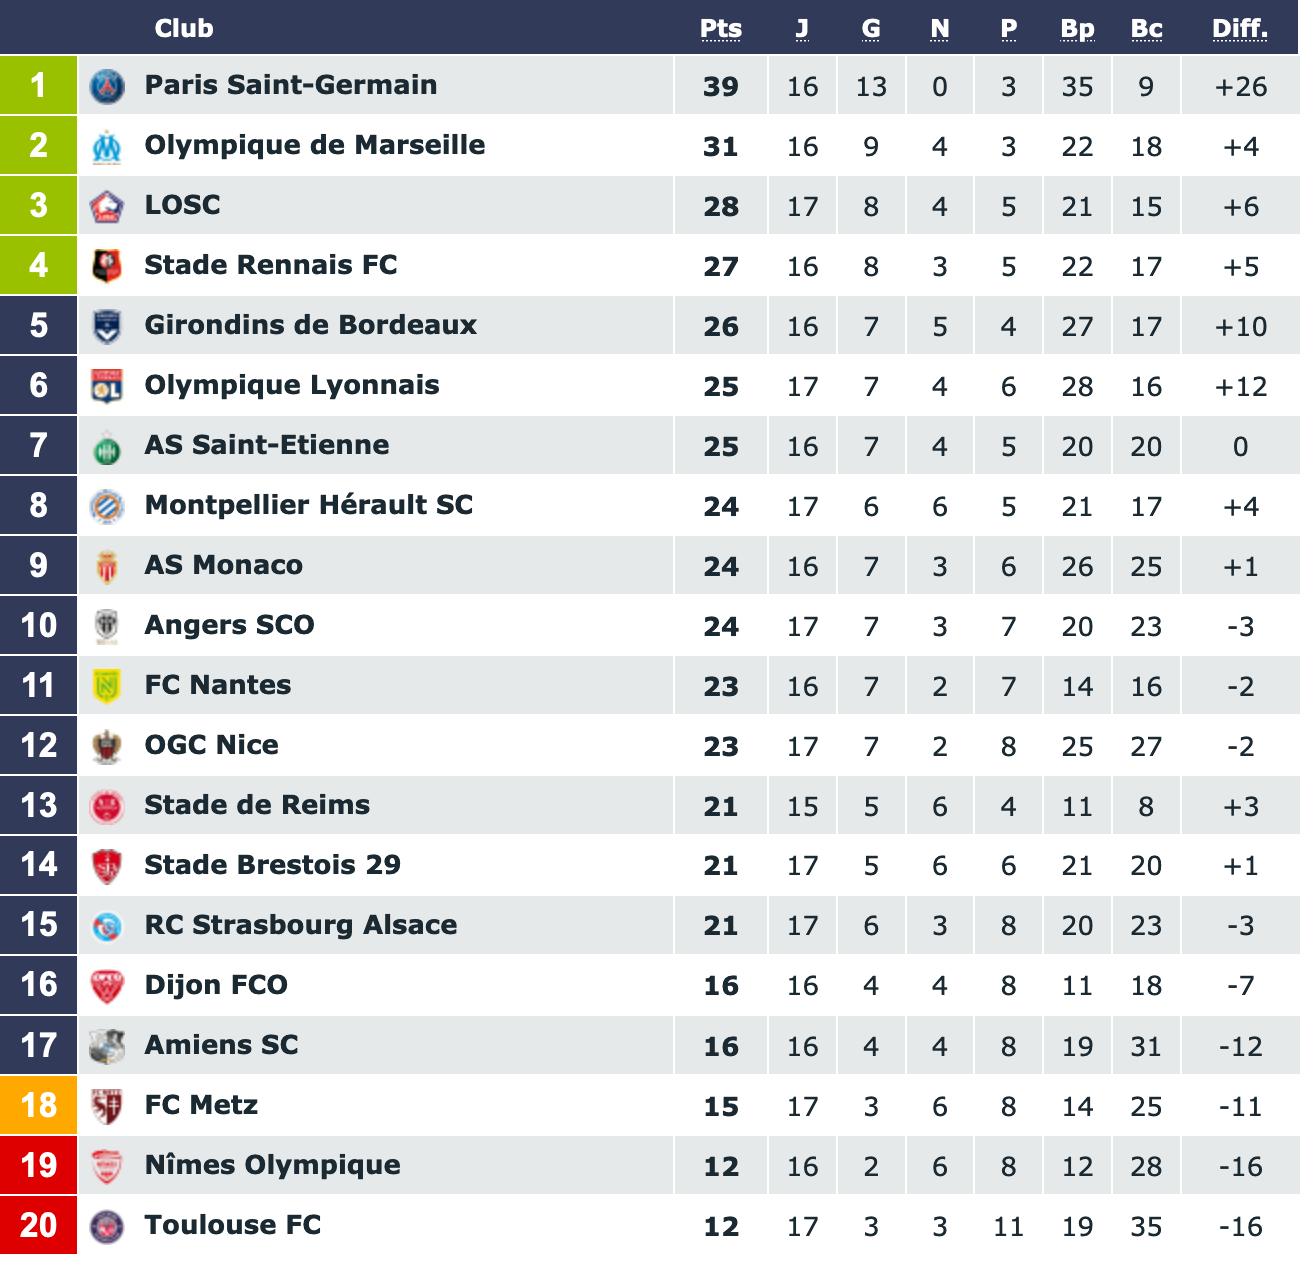 Screenshot_2019-12-07 Classement Ligue 1 Conforama saison 2019 2020(1).png (232 KB)